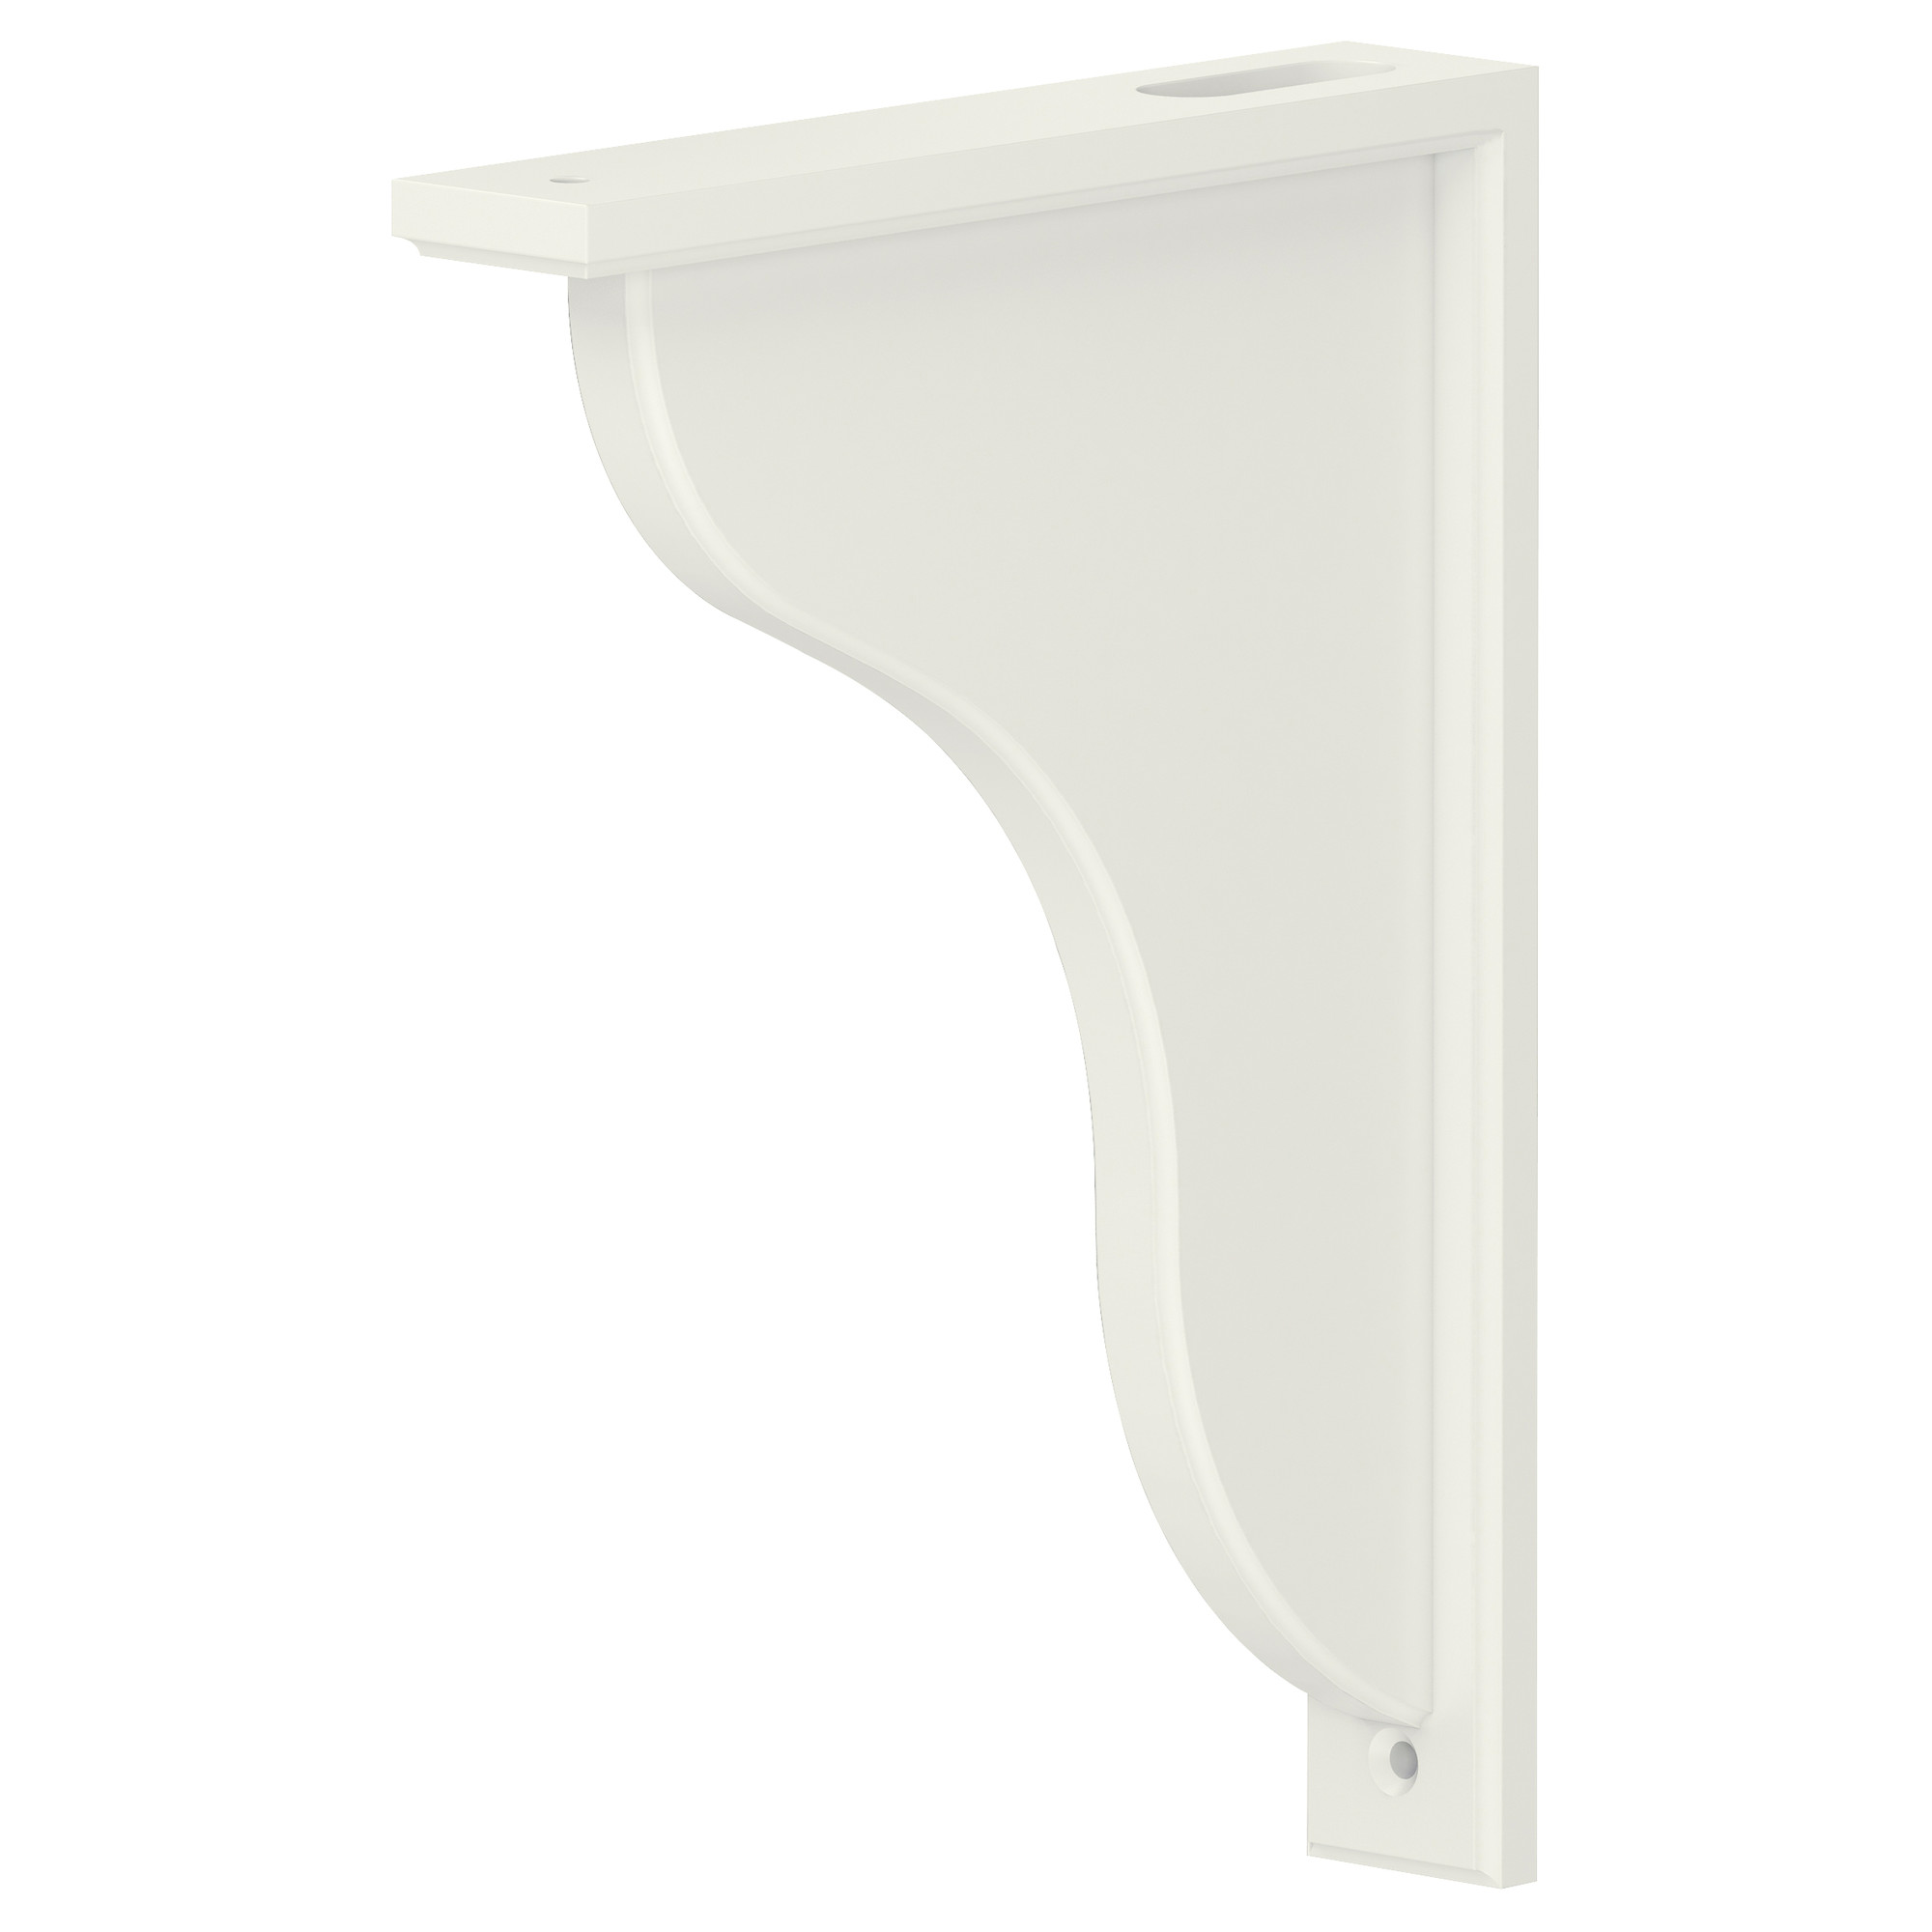 Stunning EKBY HENSVIK Bracket - IKEA white wall shelves with brackets